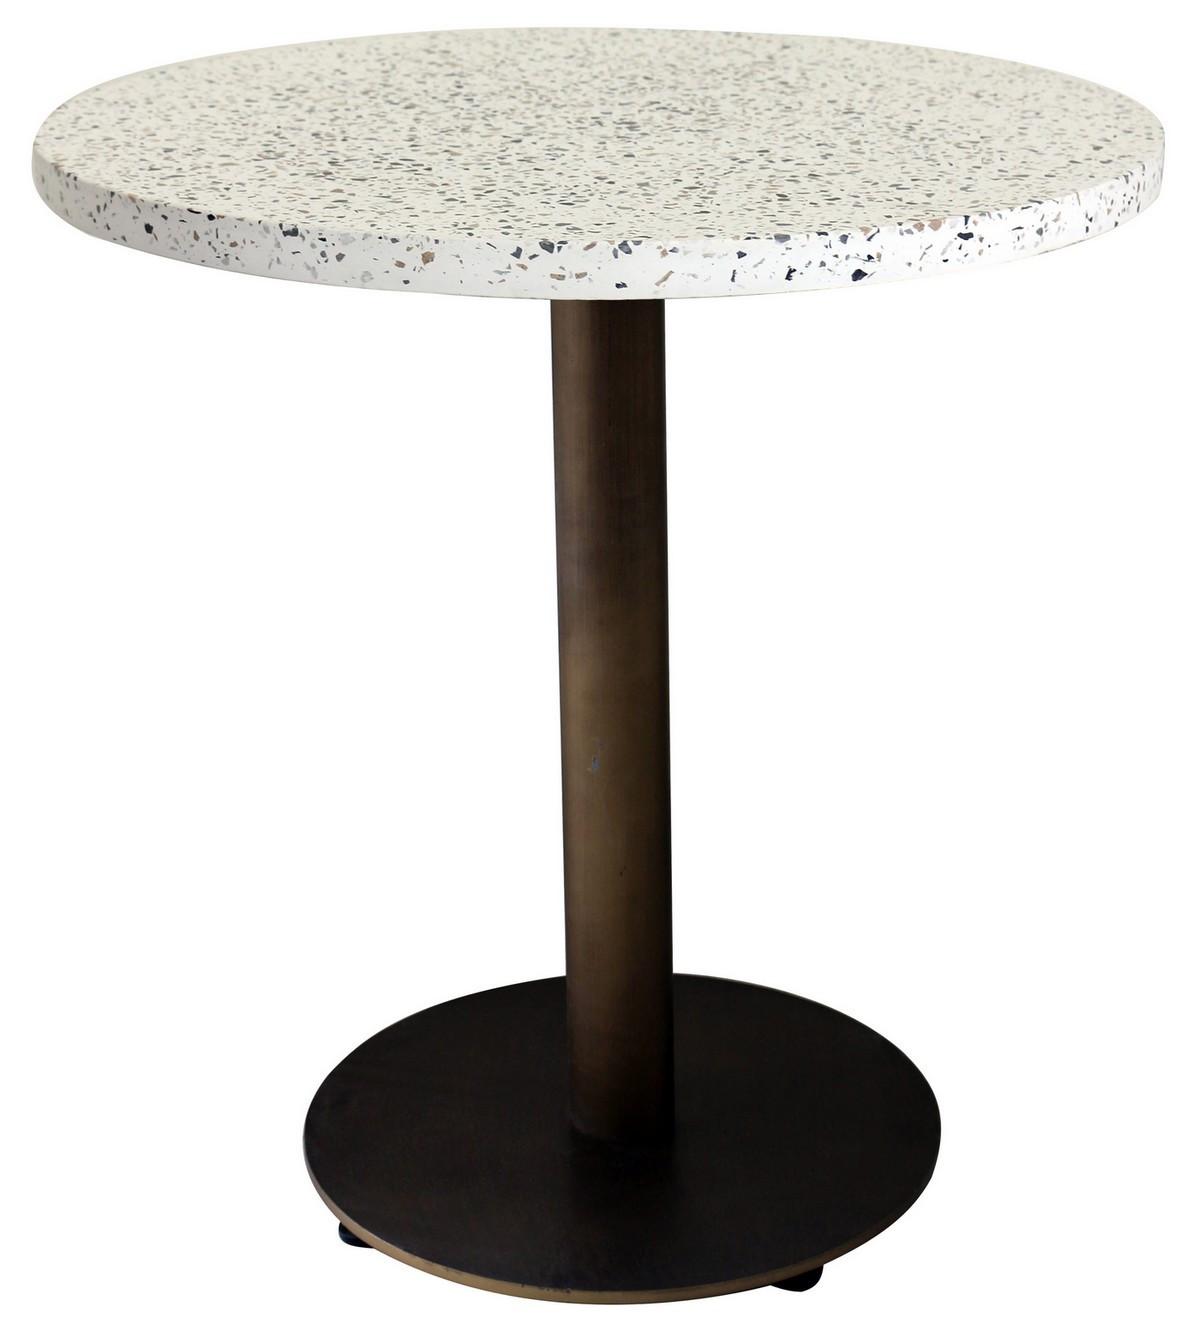 Plateau De Table En Pierre Naturelle table de repas terrazzo bronze